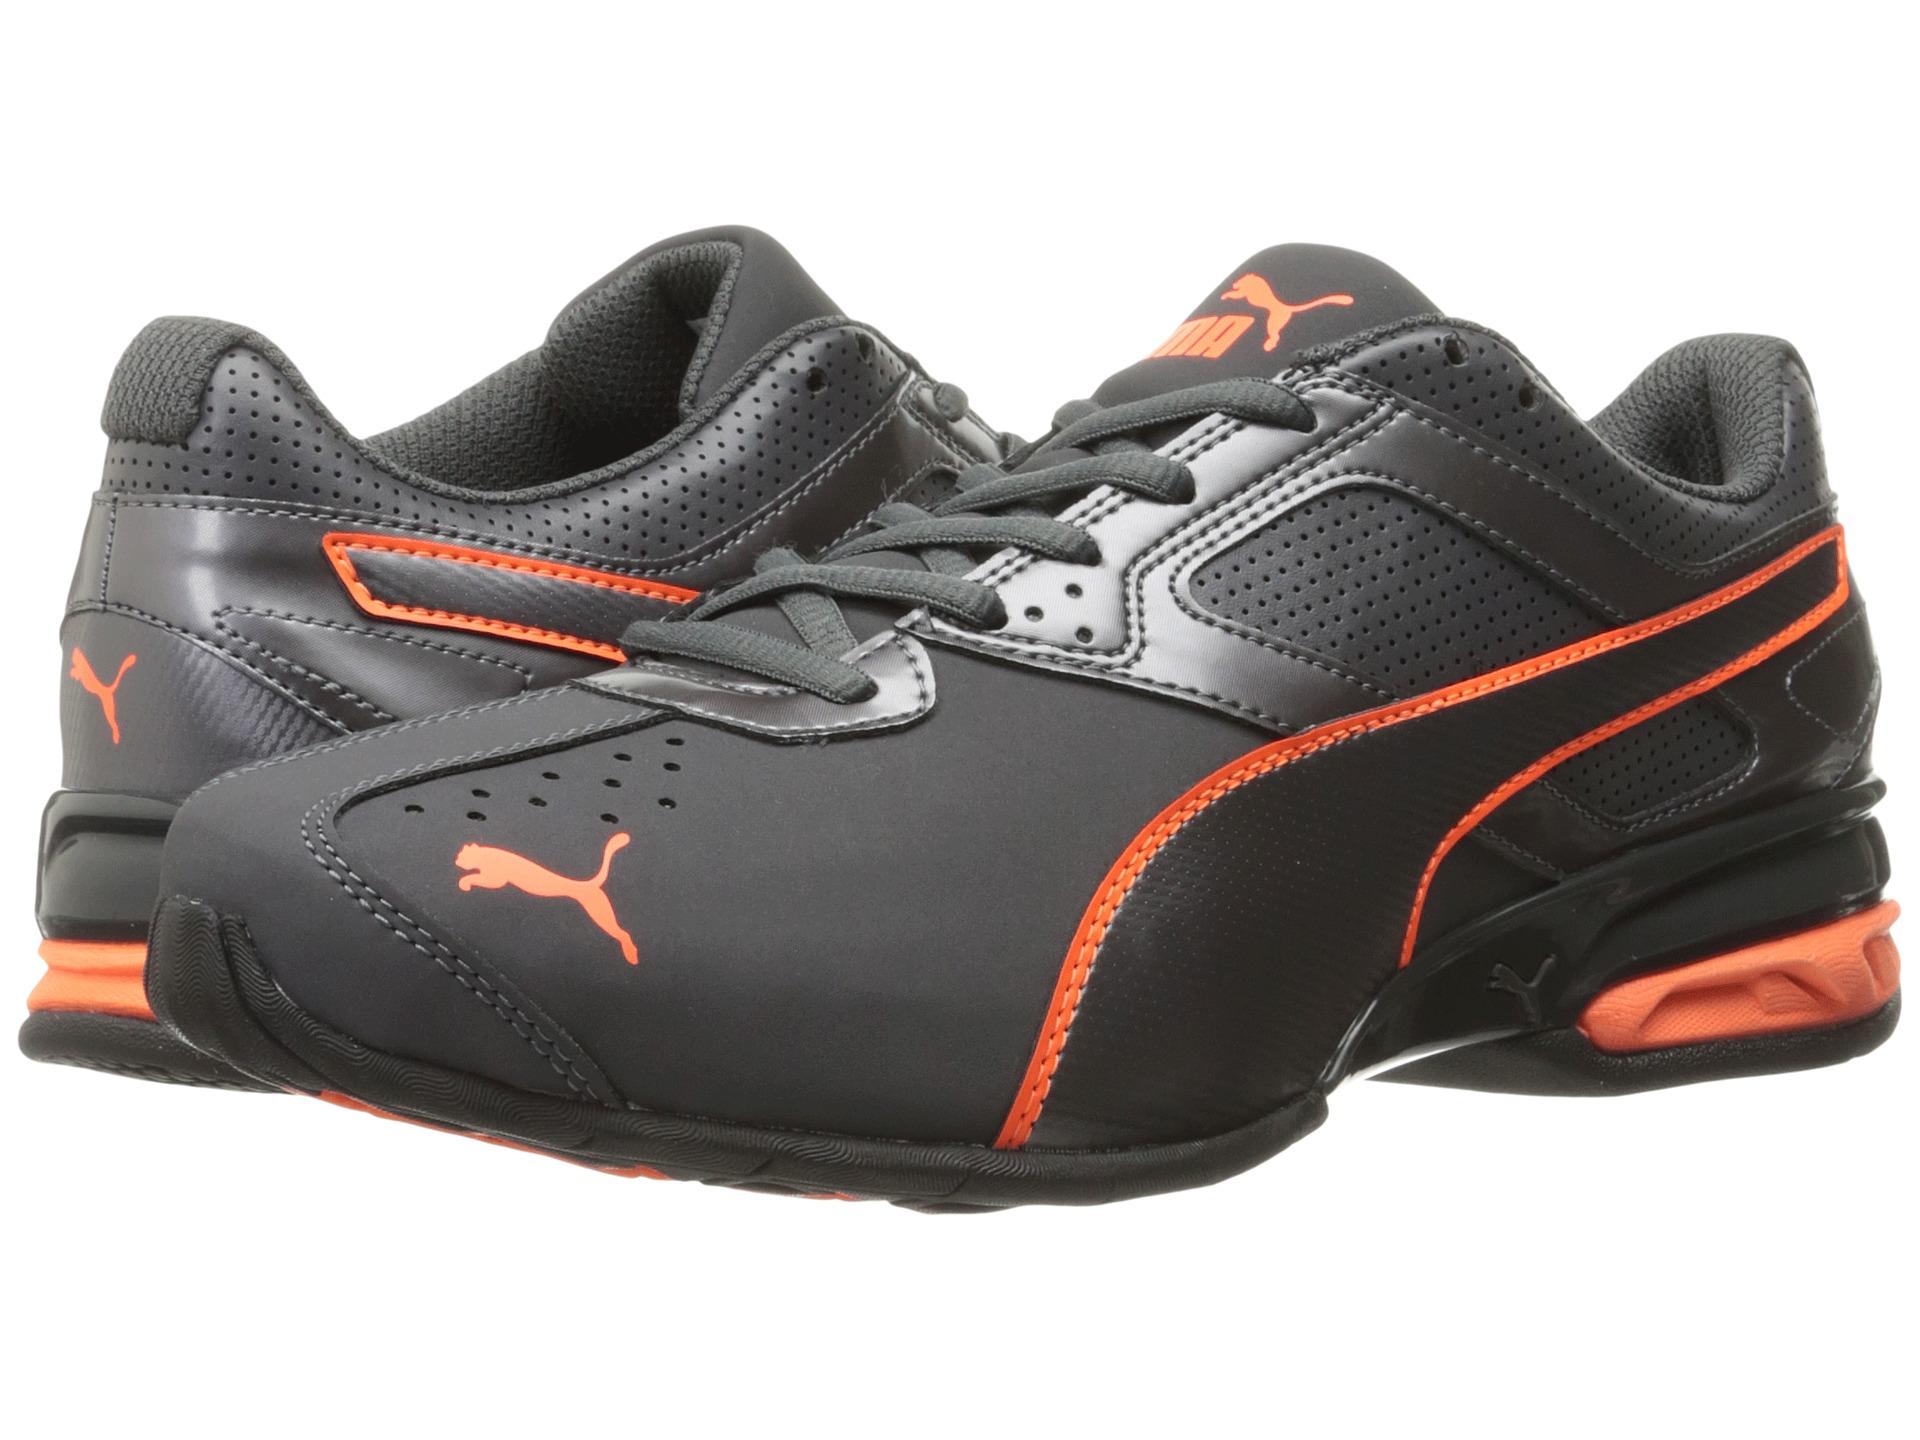 Puma Running Shoes Zappos